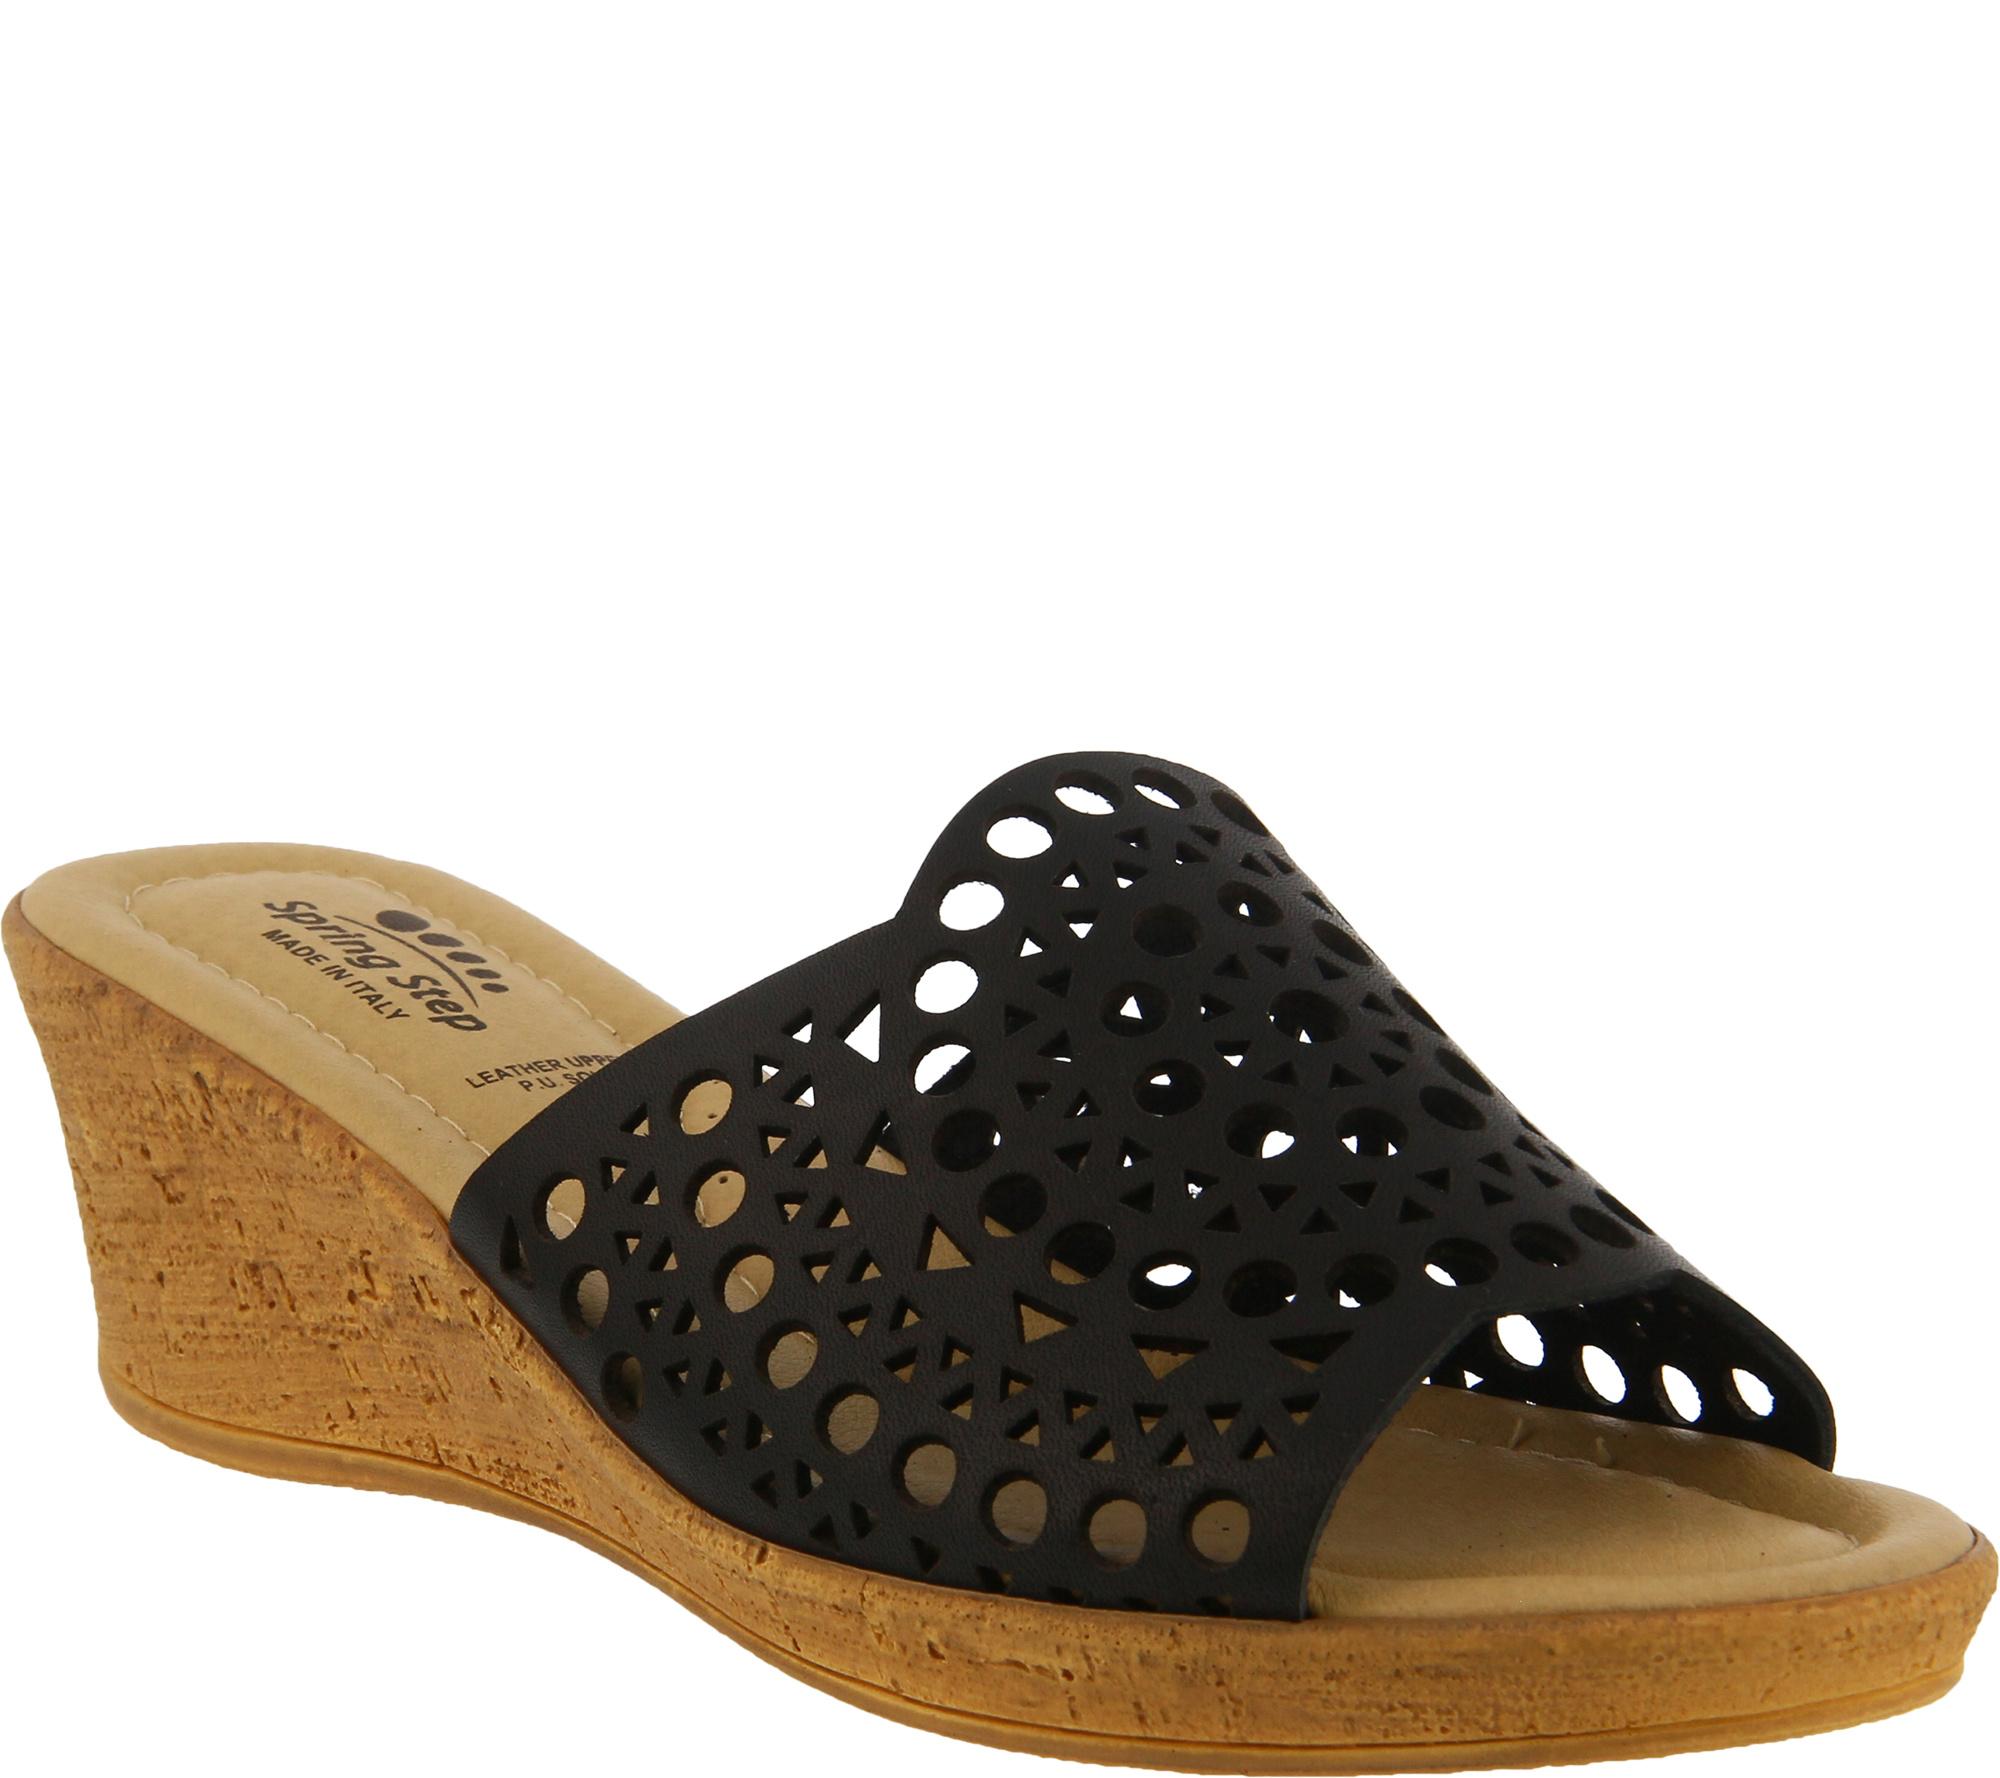 Spring Step Leather Wedge Sandals - Martha